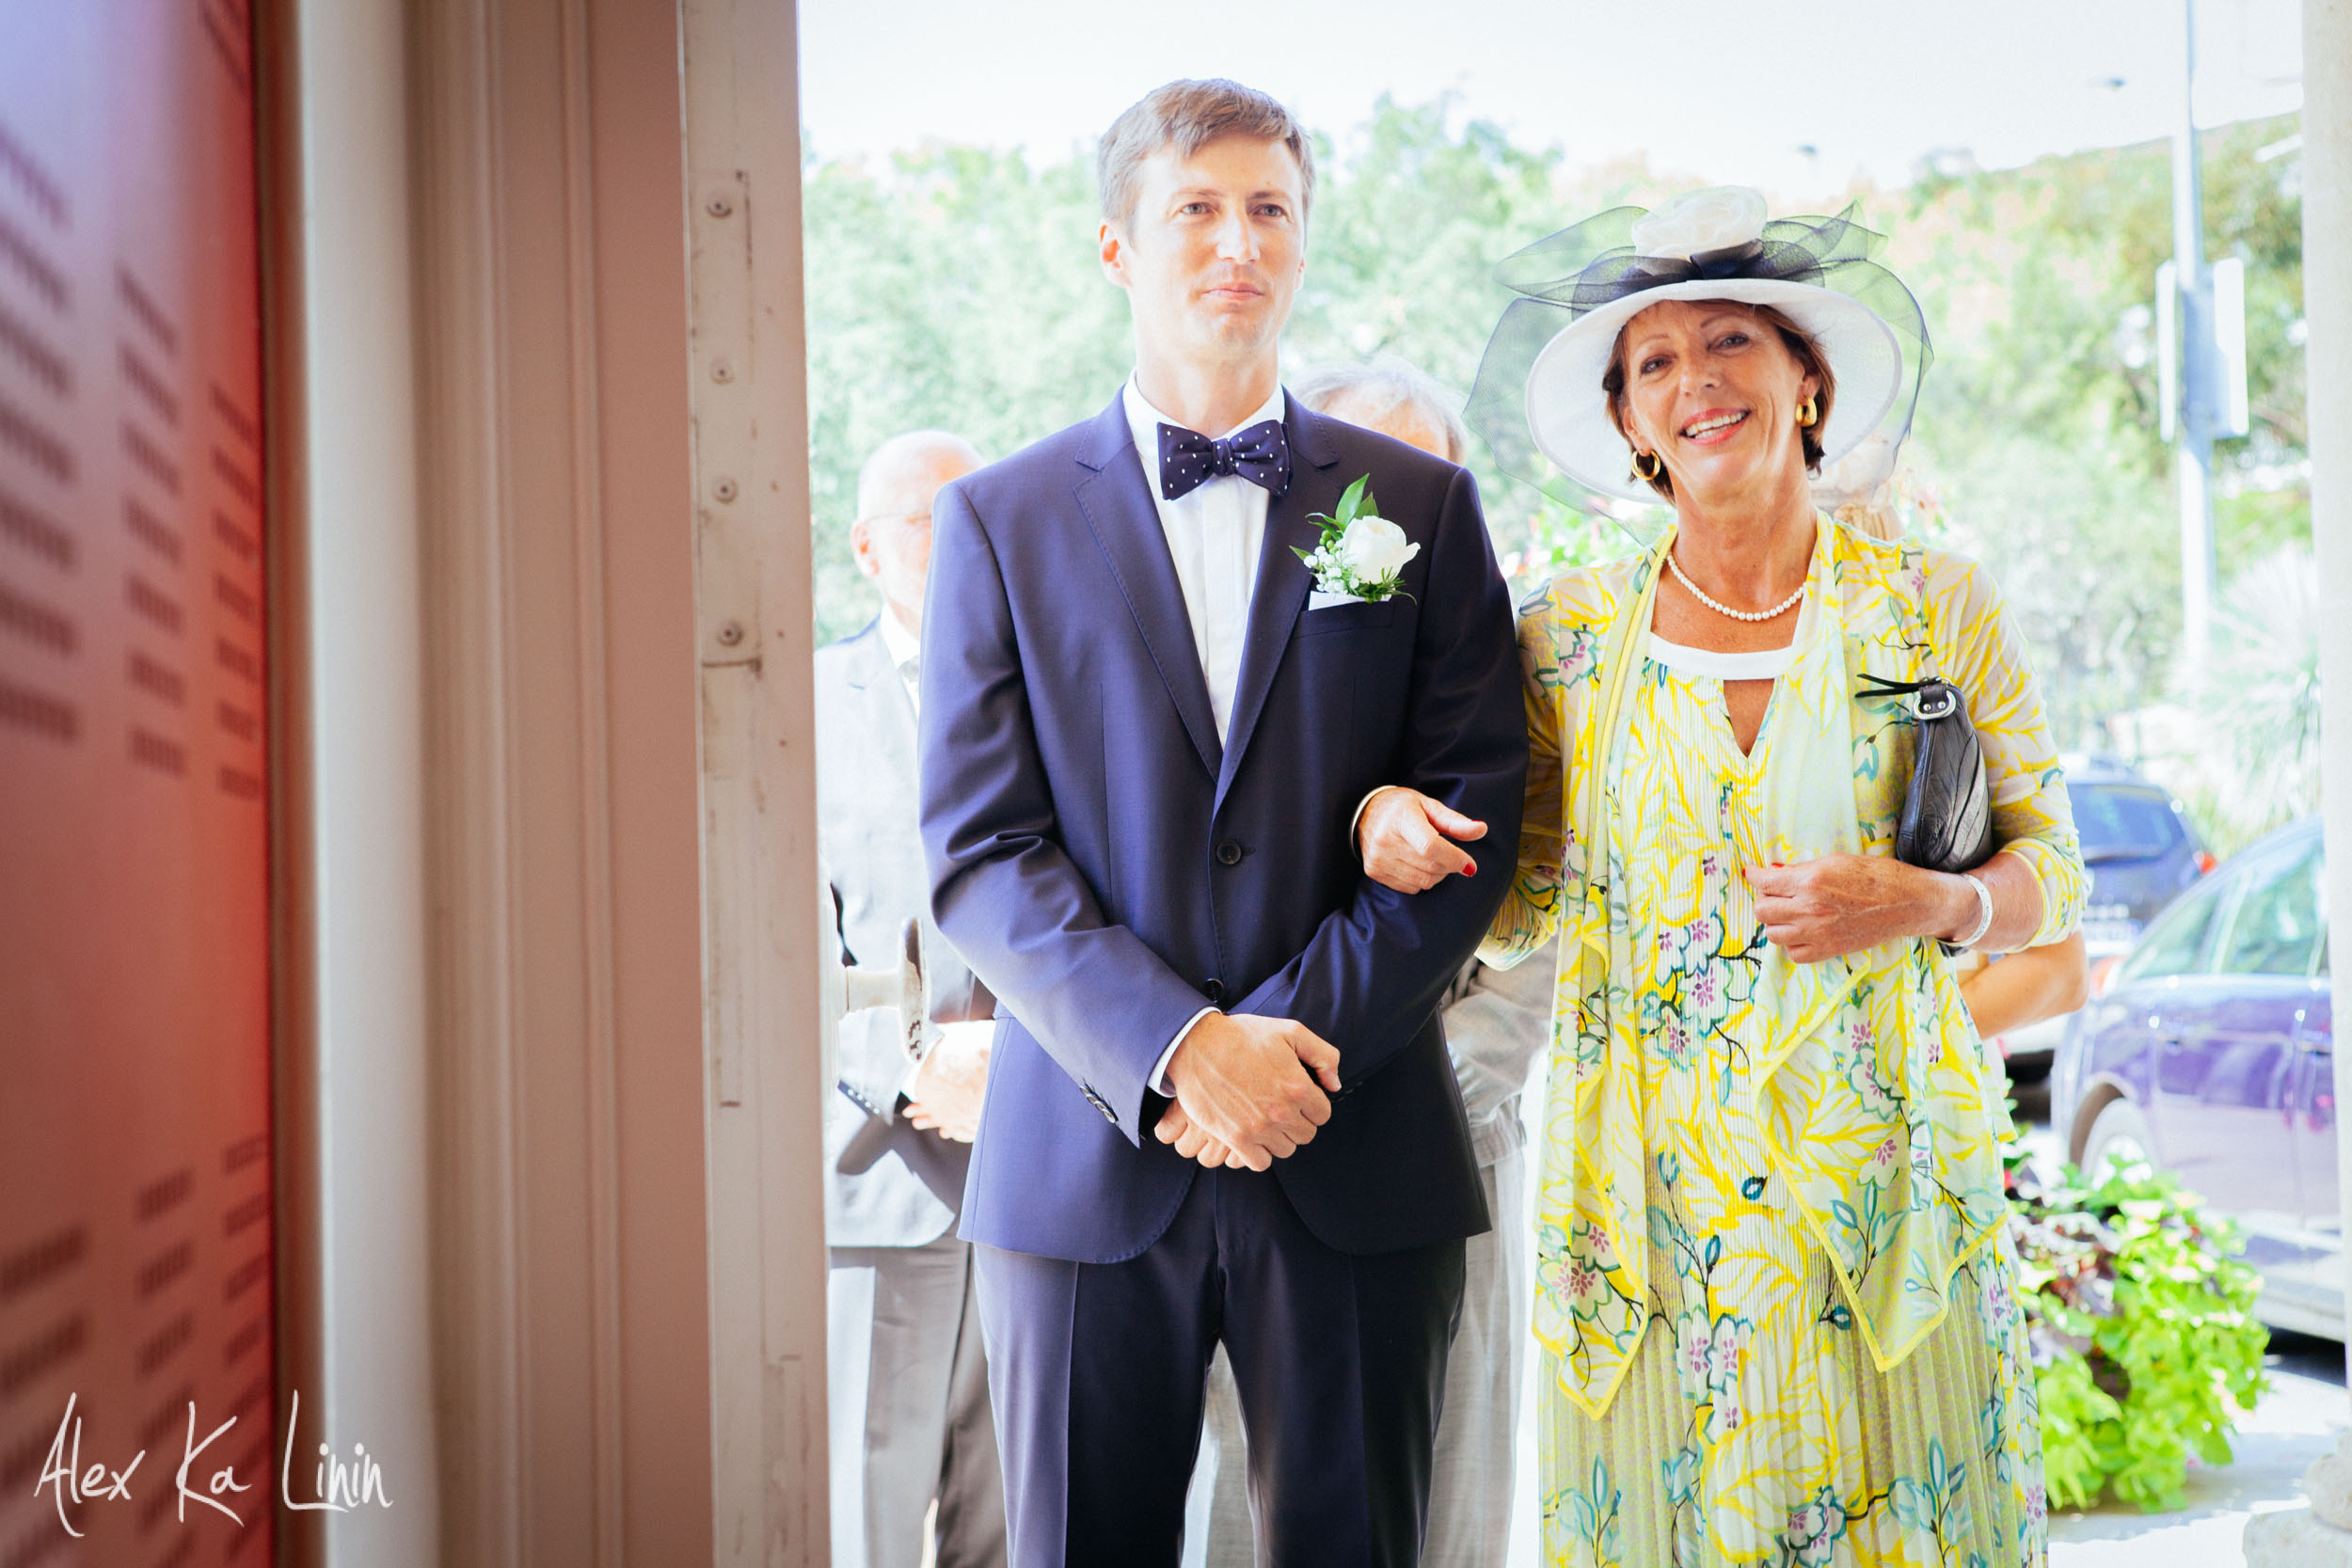 AlexKa_wedding_mariage_photographer-11.jpg